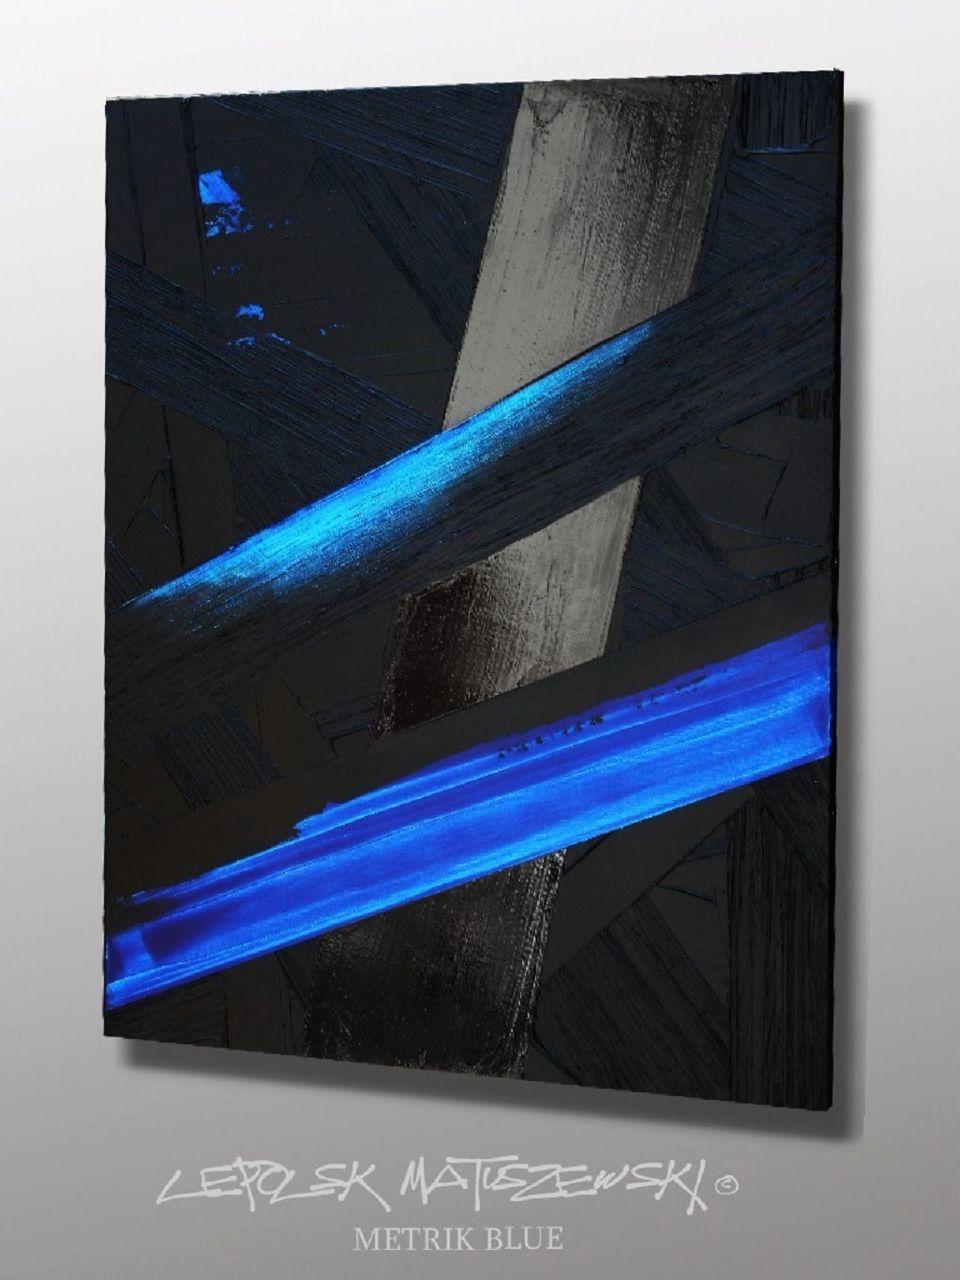 MK  Lepolsk Matuszewski METRIK BLUE  expressionnisme abstrait